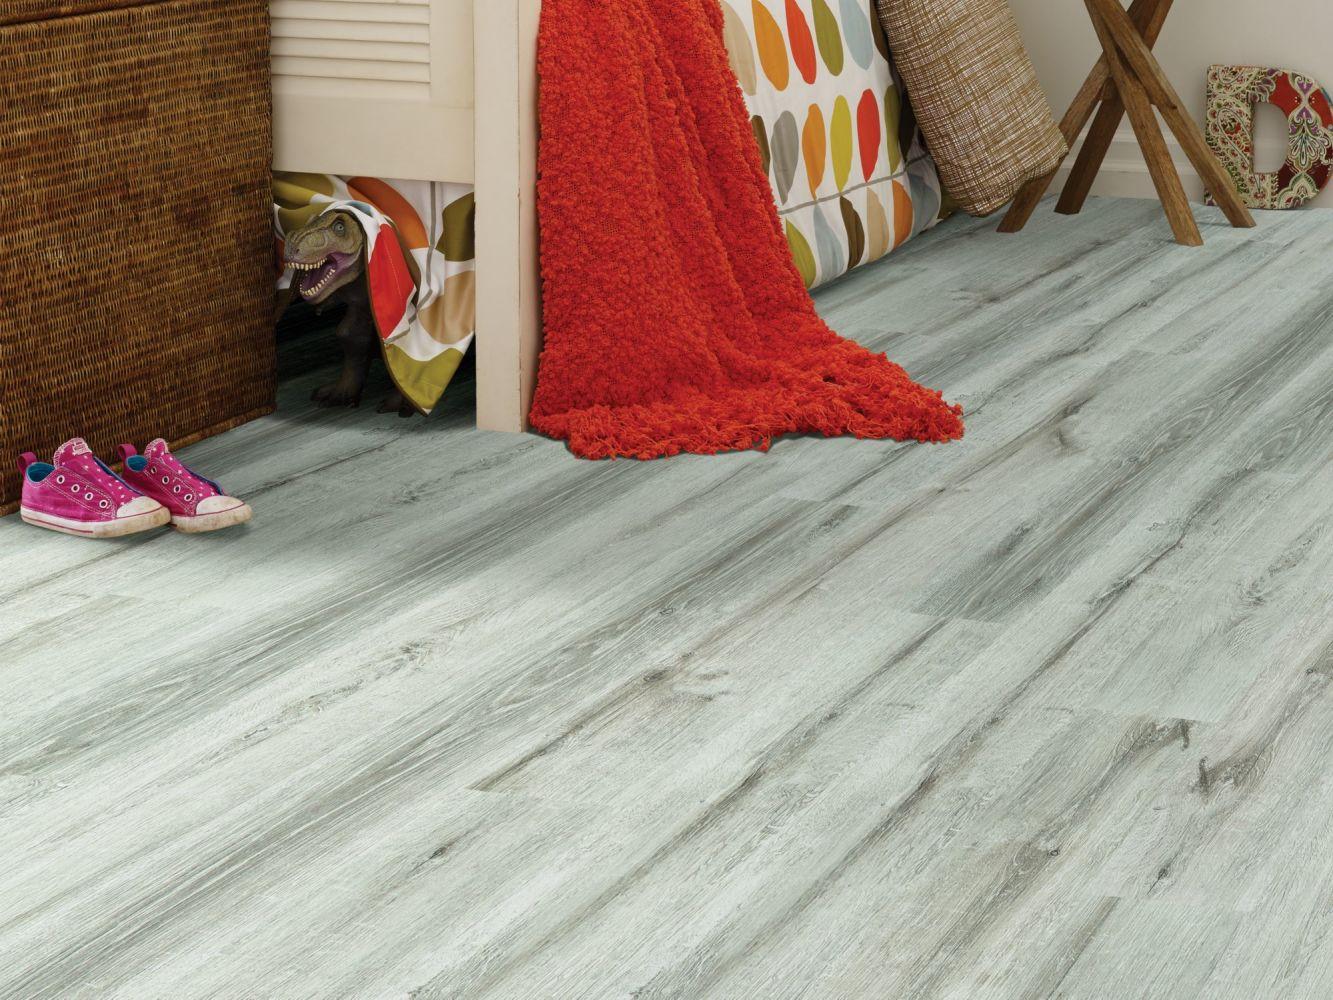 Shaw Floors Resilient Property Solutions Elan Plank Beach Oak 01023_VE388